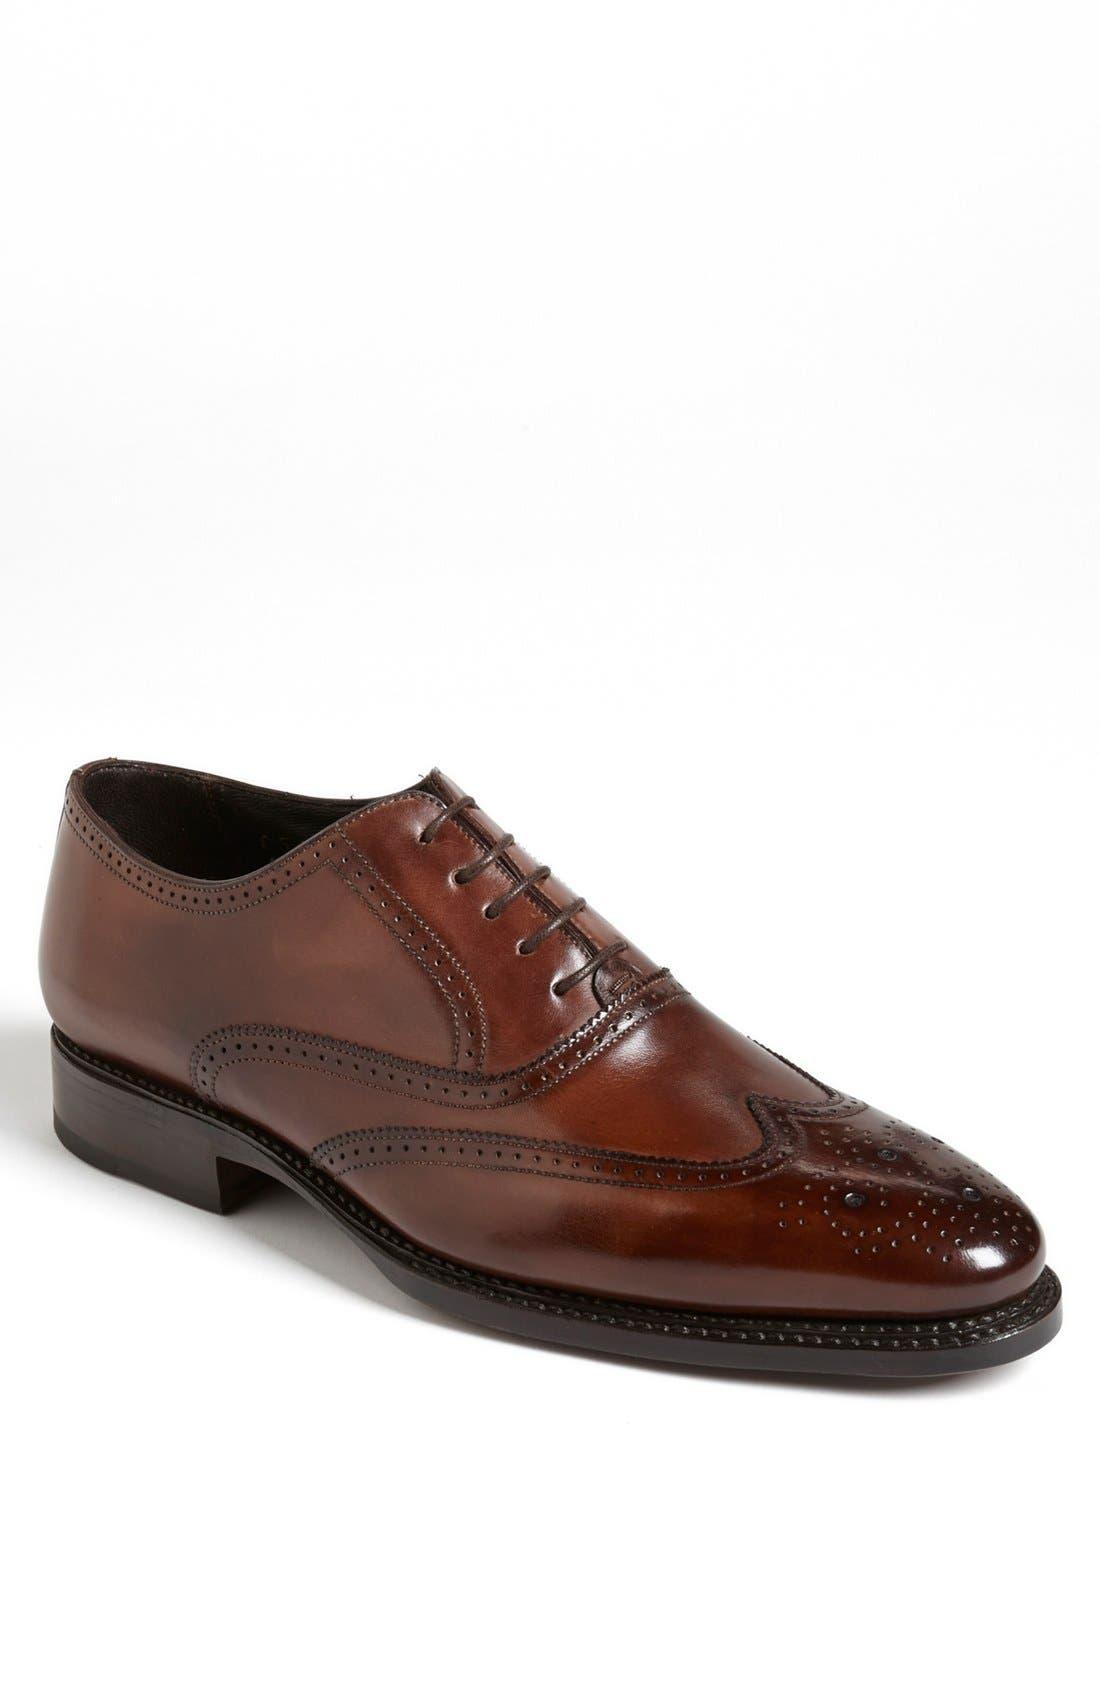 Alternate Image 1 Selected - Canali Leather Wingtip (Men)